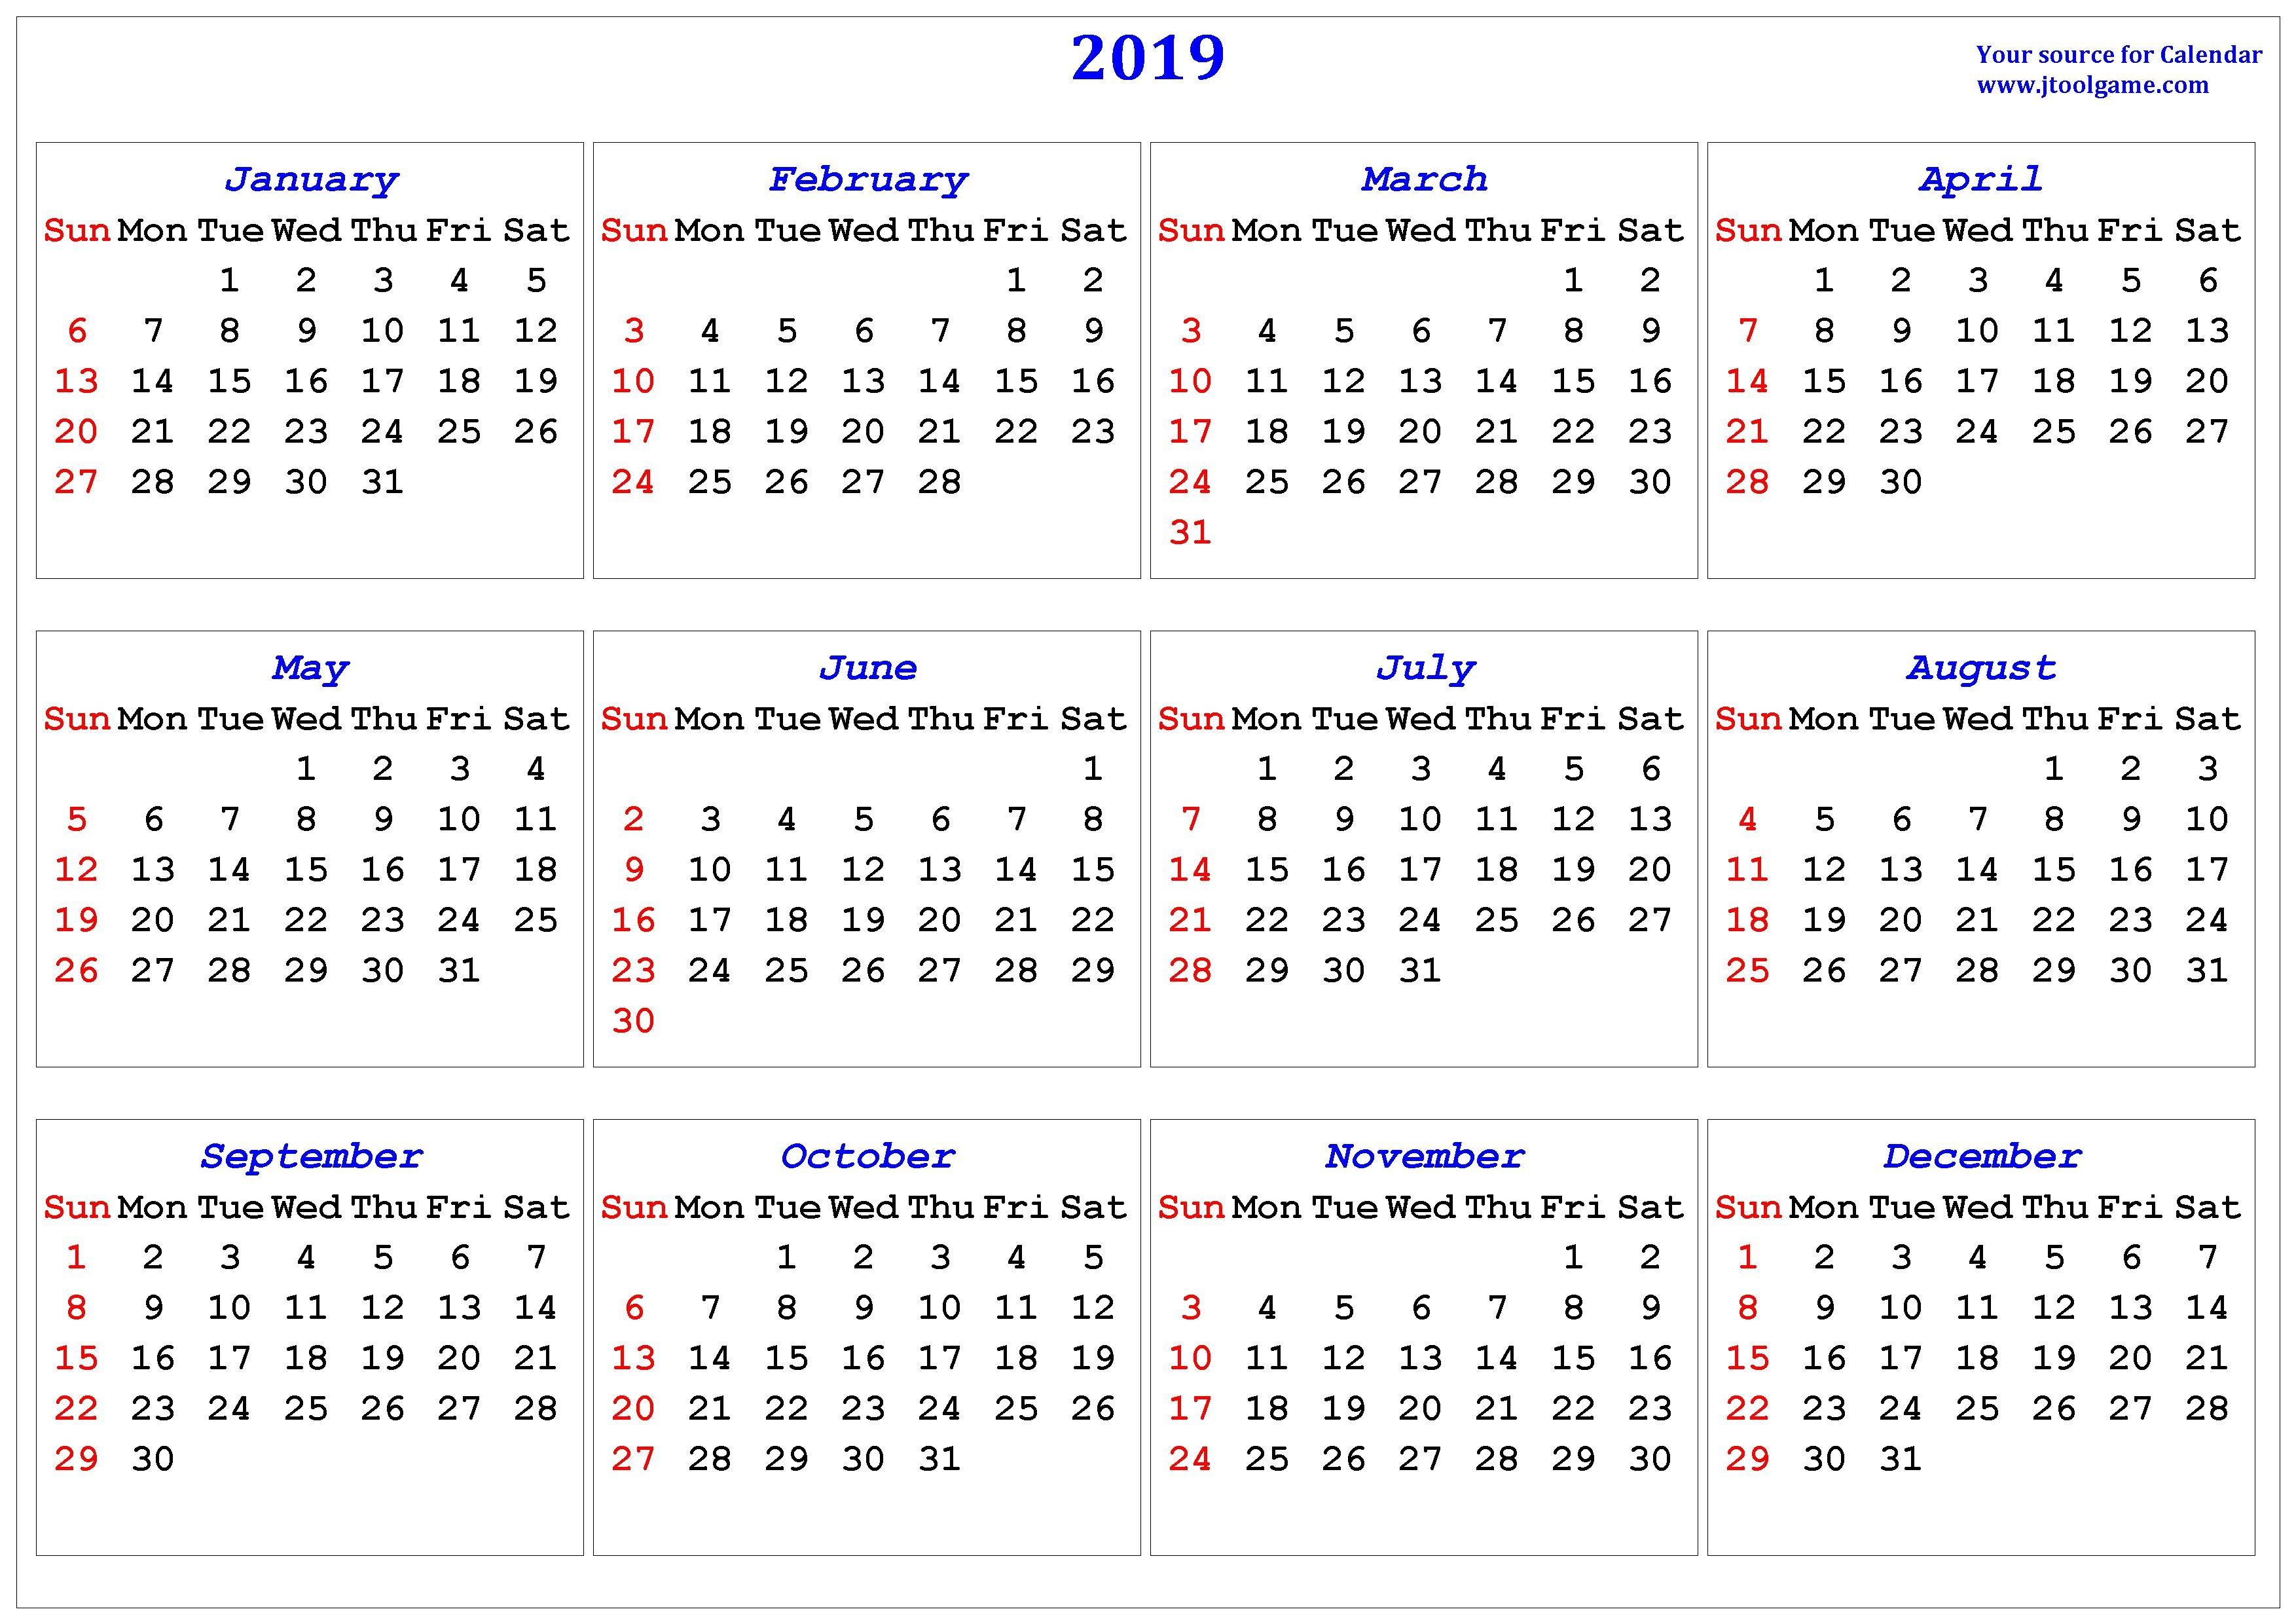 2019 Calendar - Printable Calendar. 2019 Calendar In Multiple Colors Calendar 2019 Landscape